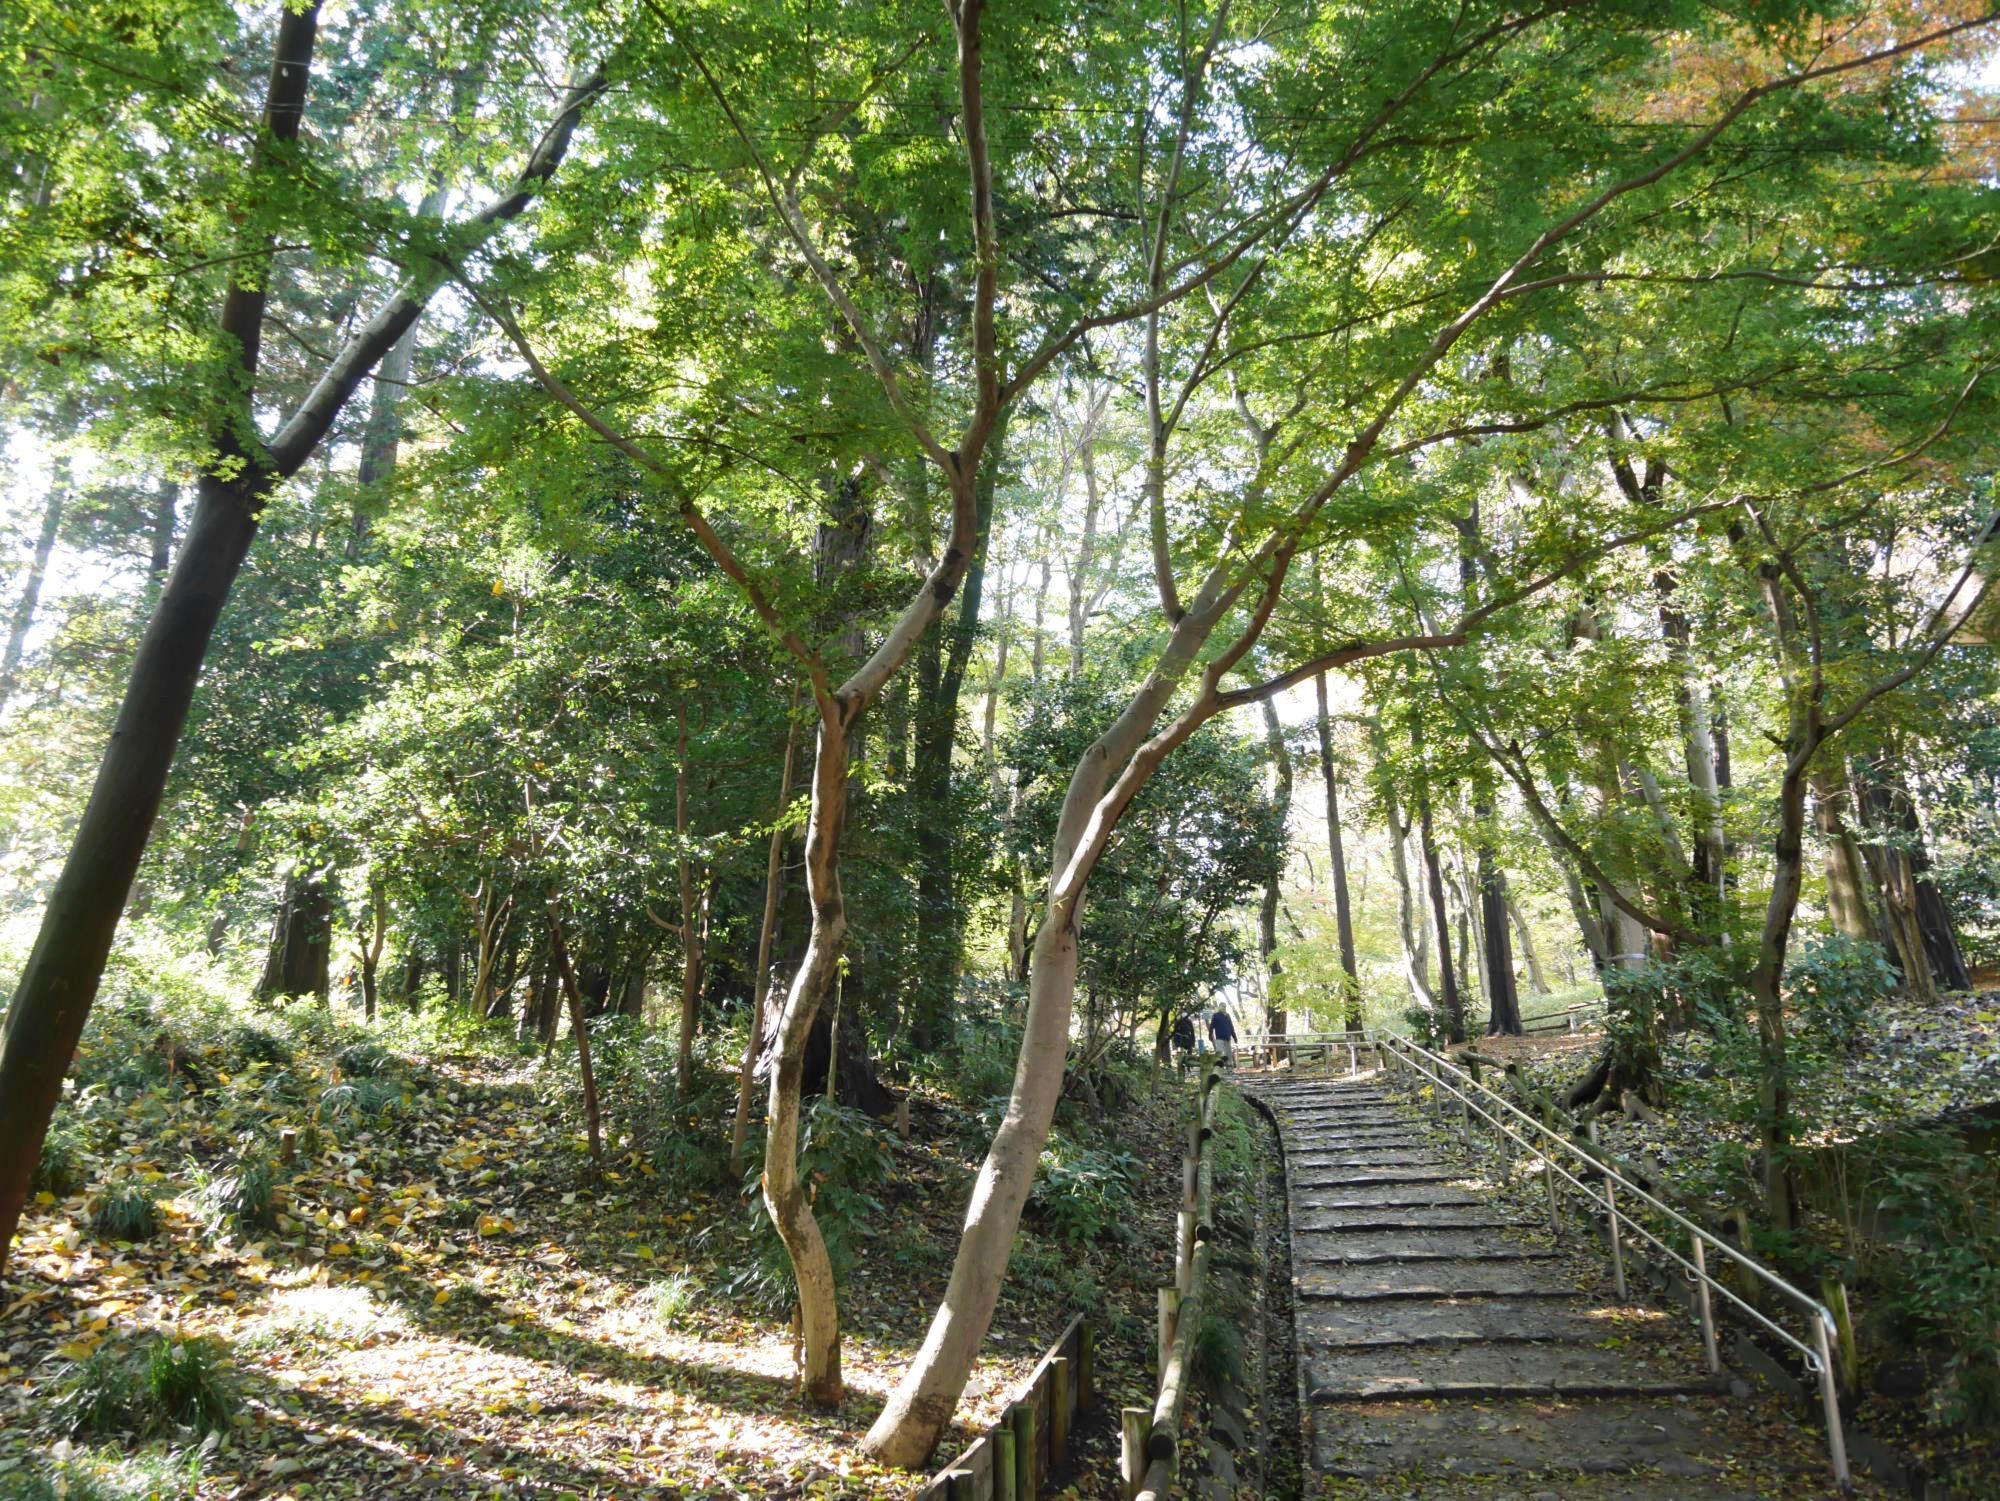 20161125-井の頭恩賜公園 (7)遊歩道階段.jpg